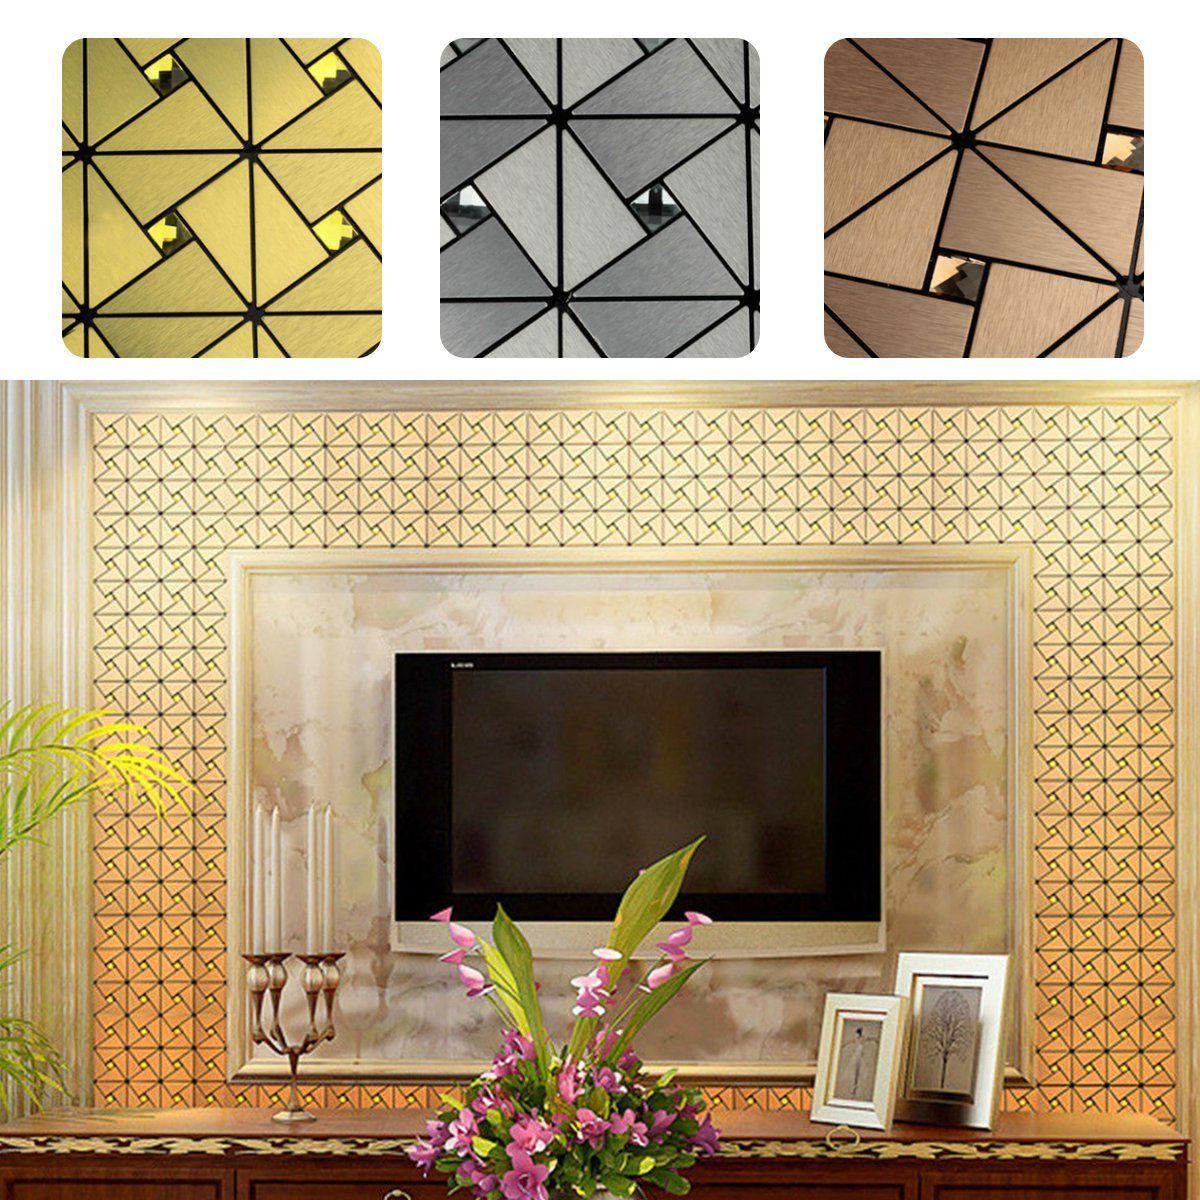 30x30Cm Aluminum Tile Self Adhesive Wallpaper Kitchen